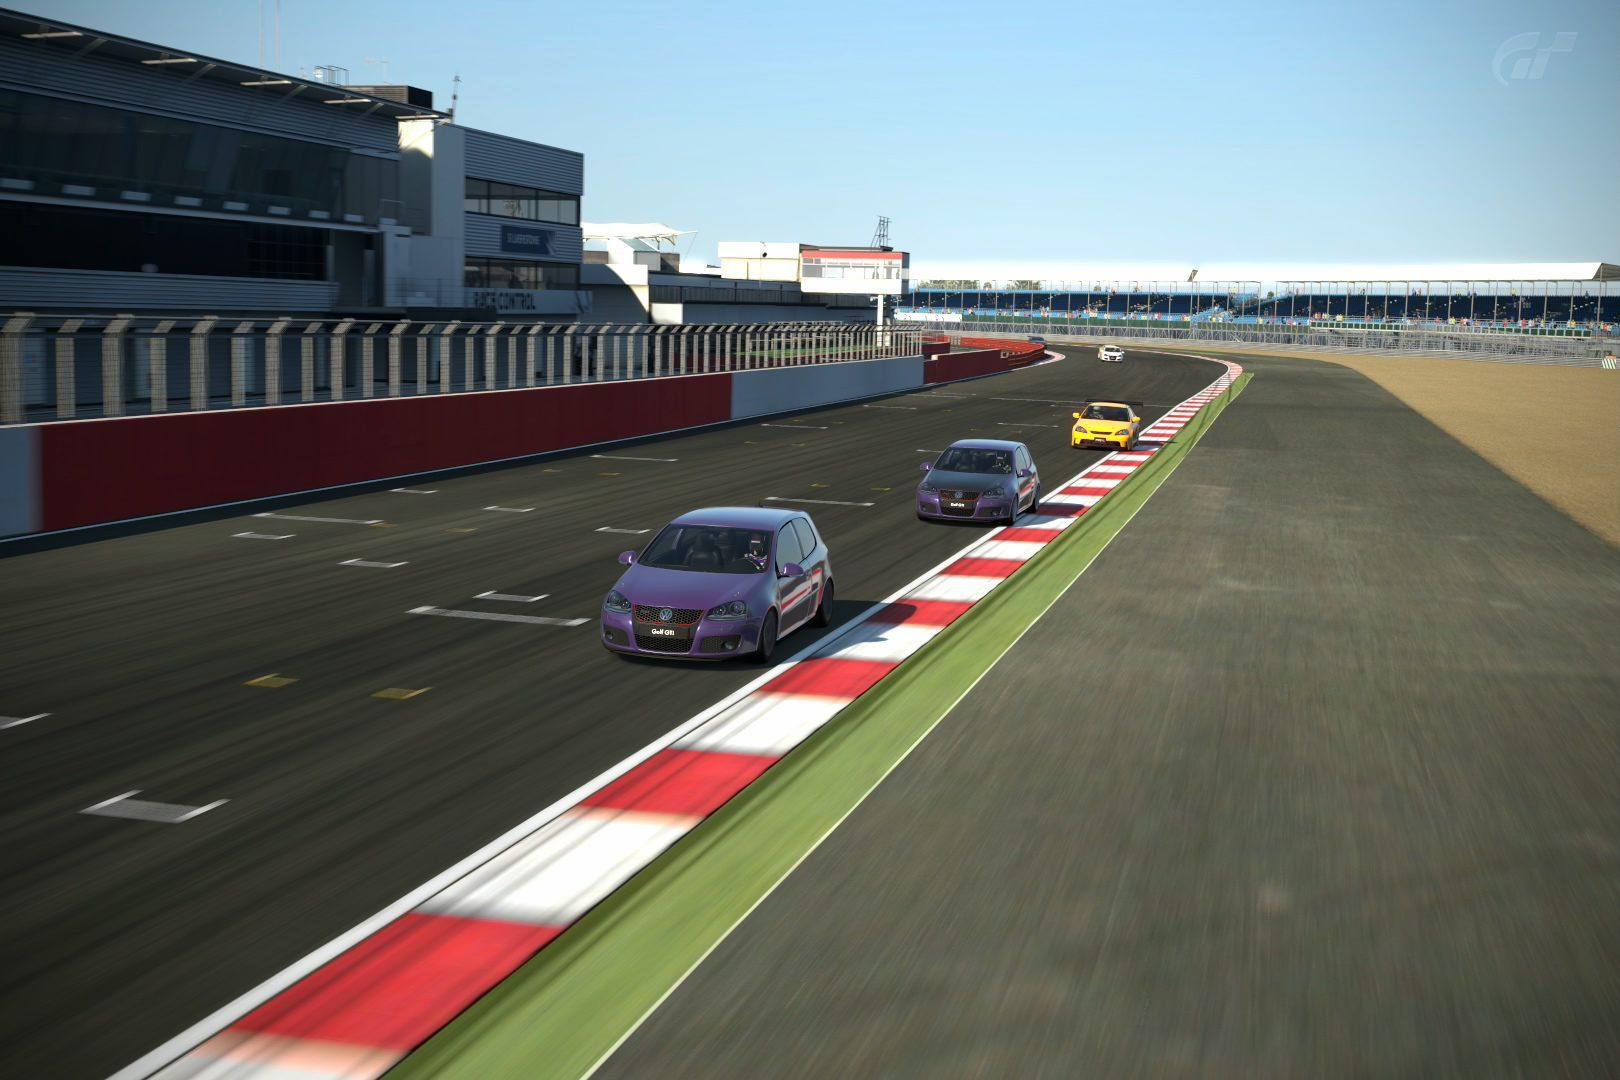 Silverstone National Circuit_1.jpg